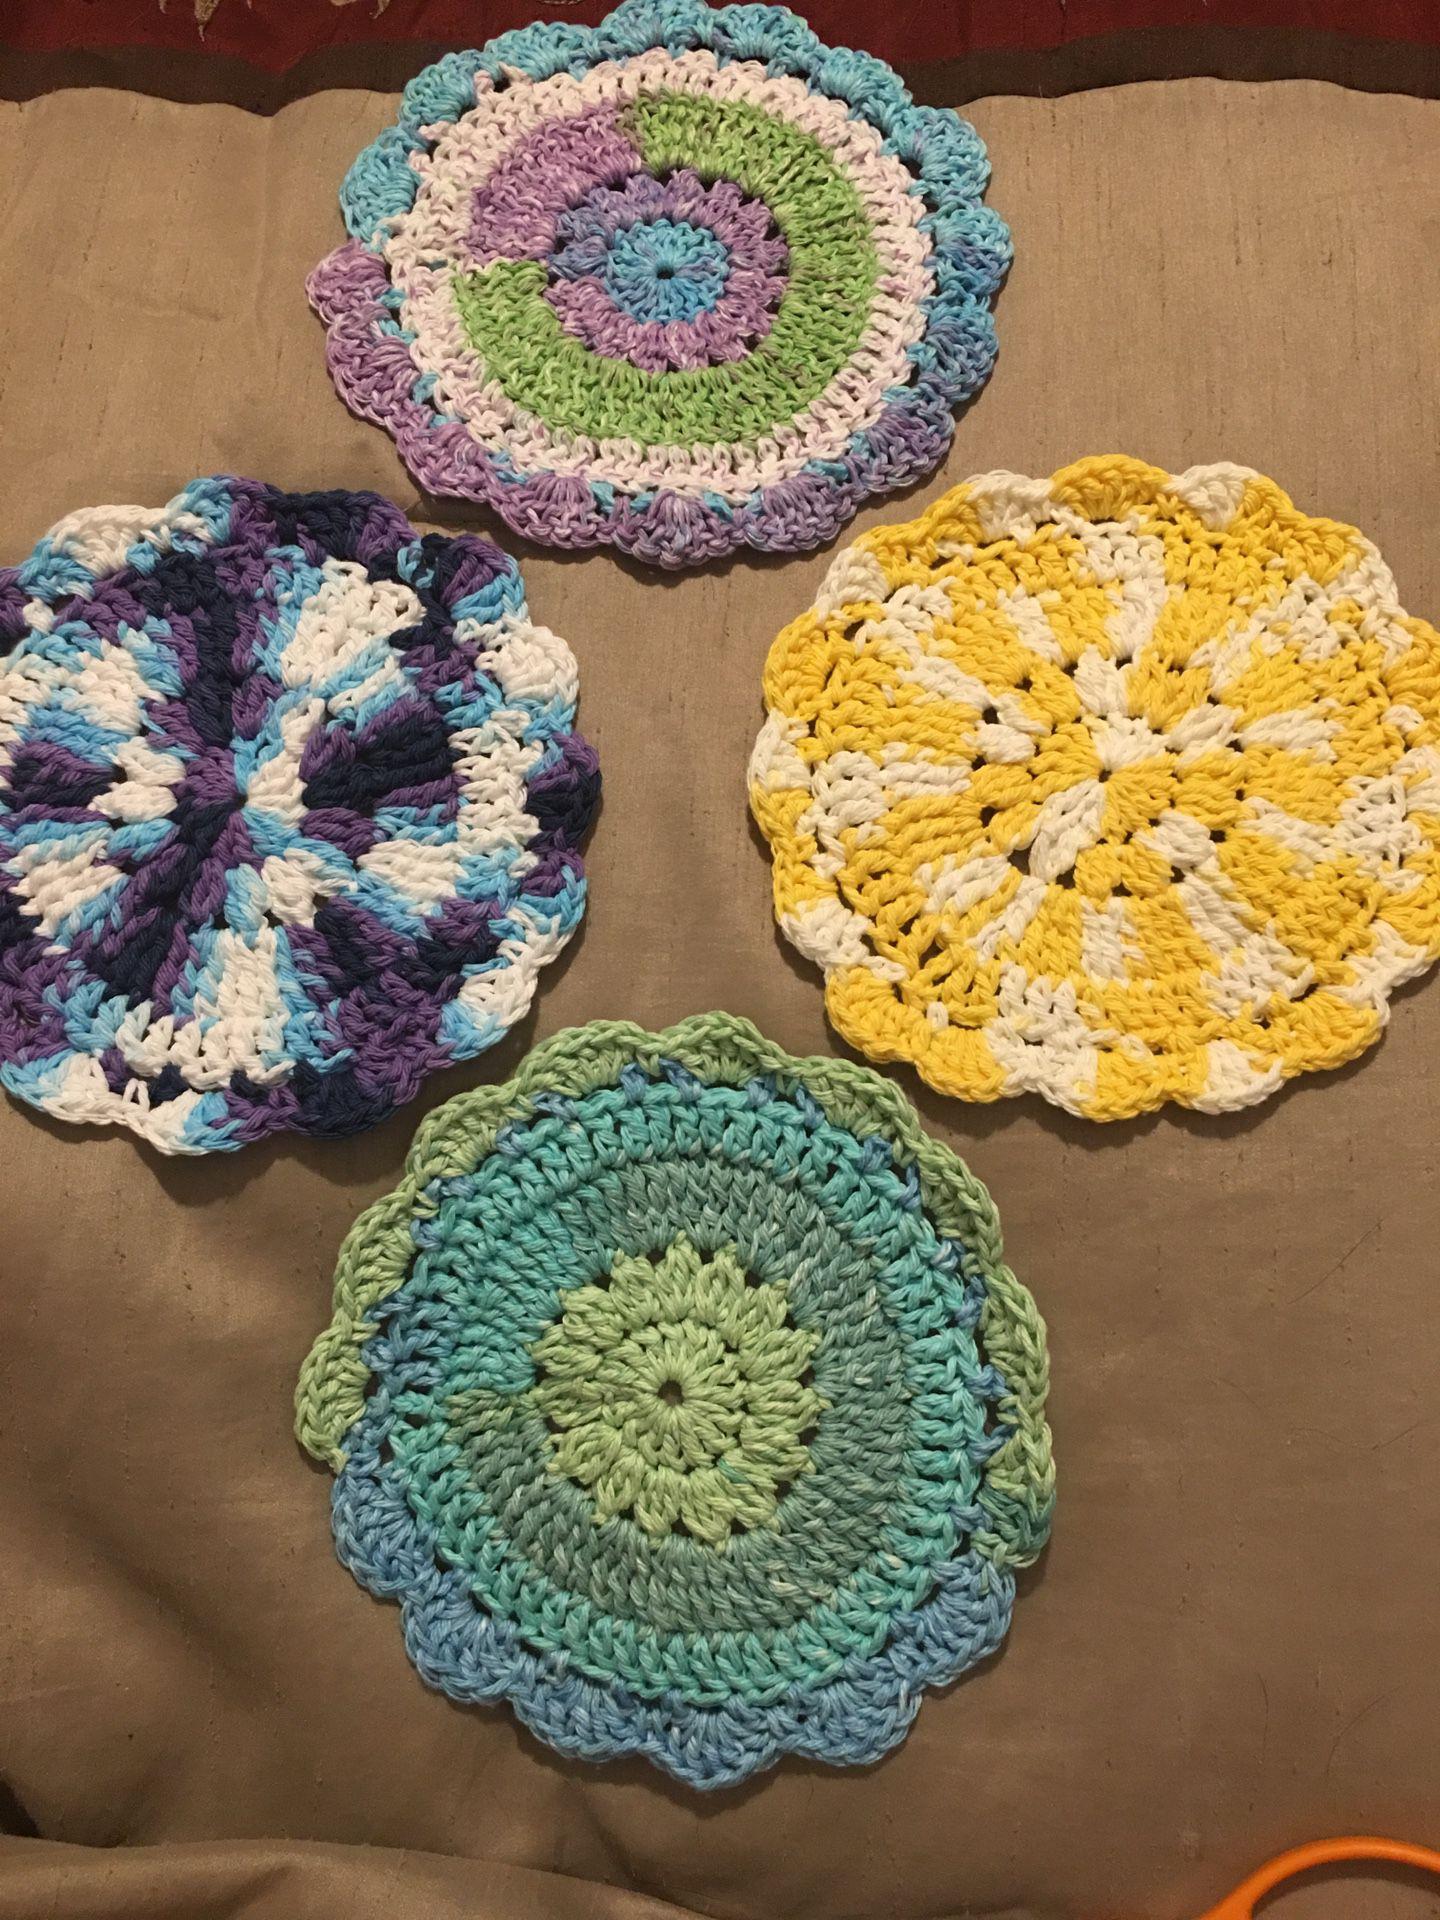 Handmade floral trivets